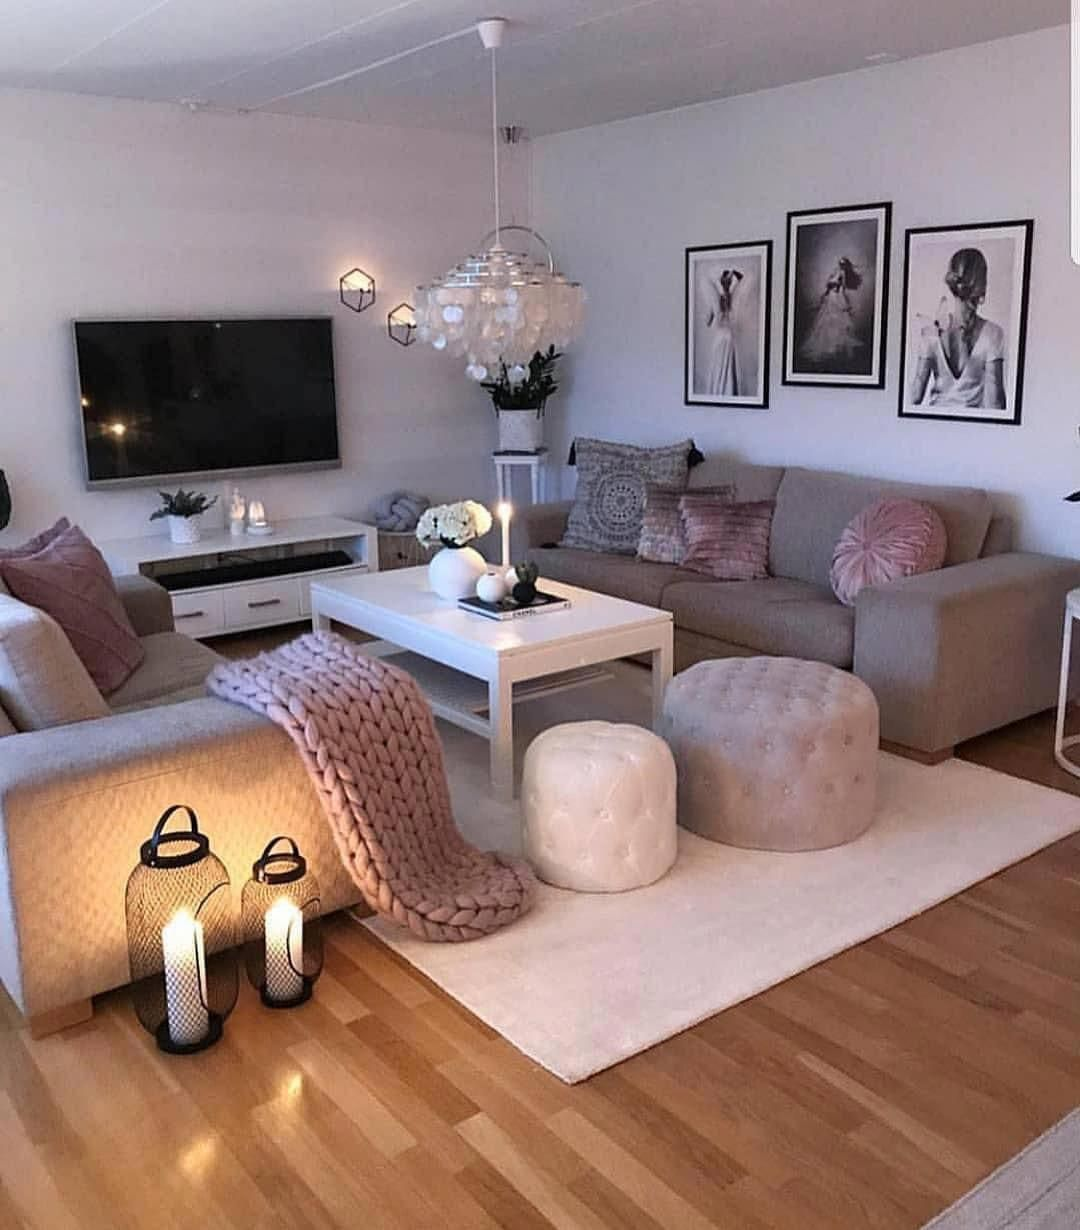 40 Most Beautiful Living Room Ideas 2019 Living Room Ideas 2019 Home Living Room Beautiful Living Rooms